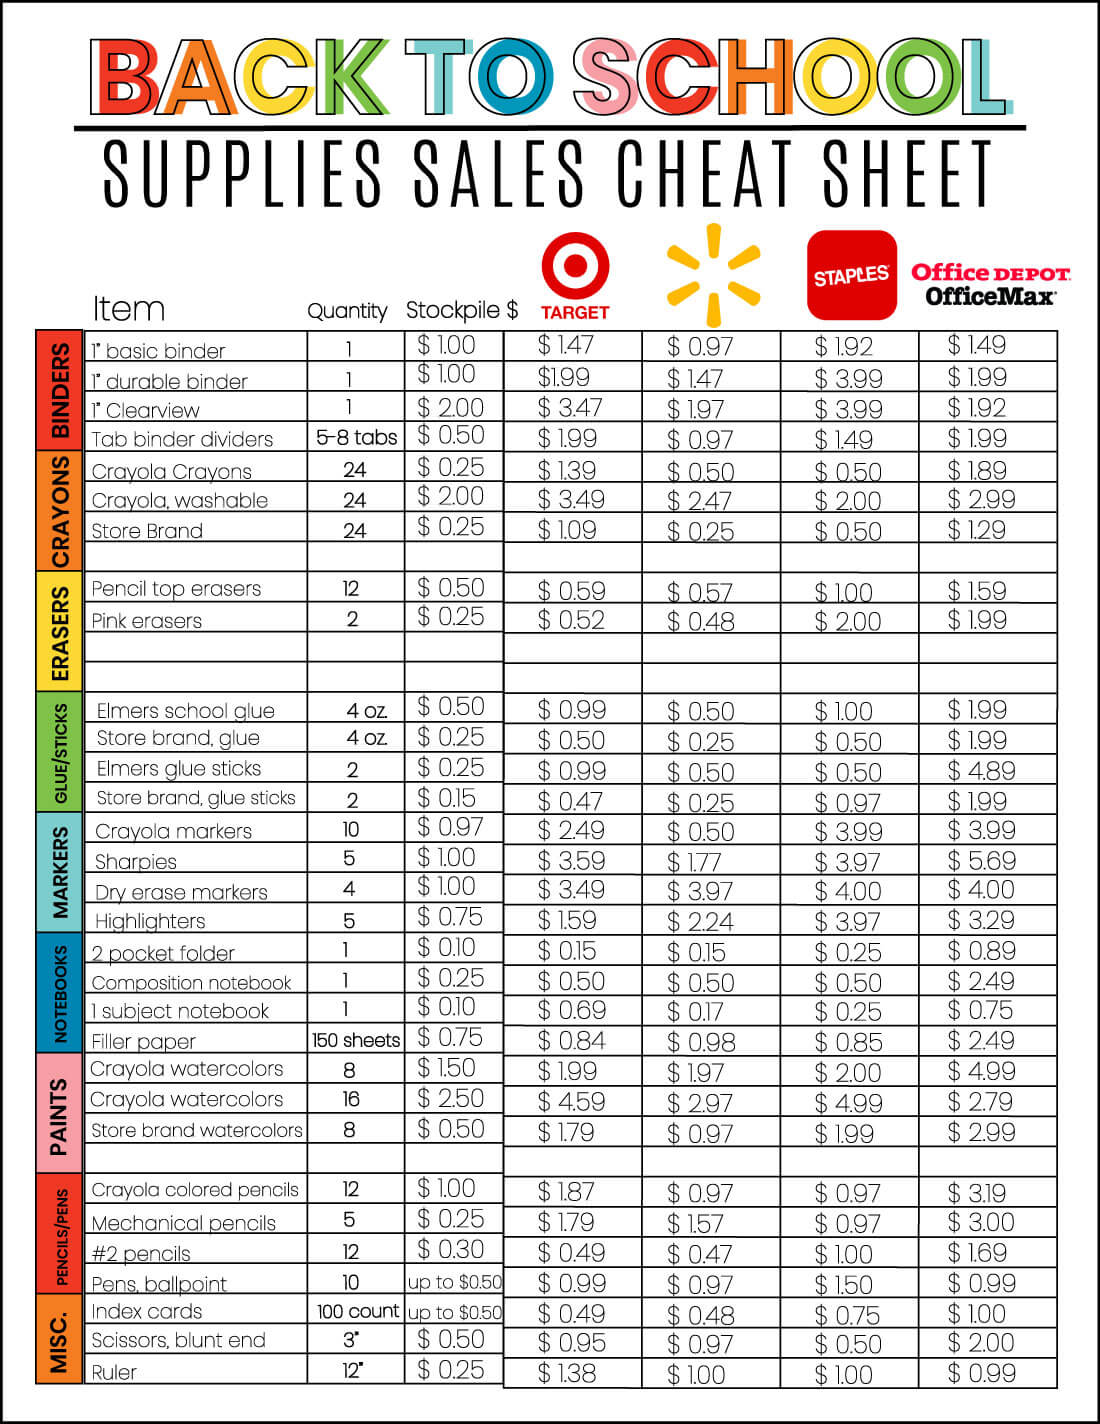 School Supplies Sales